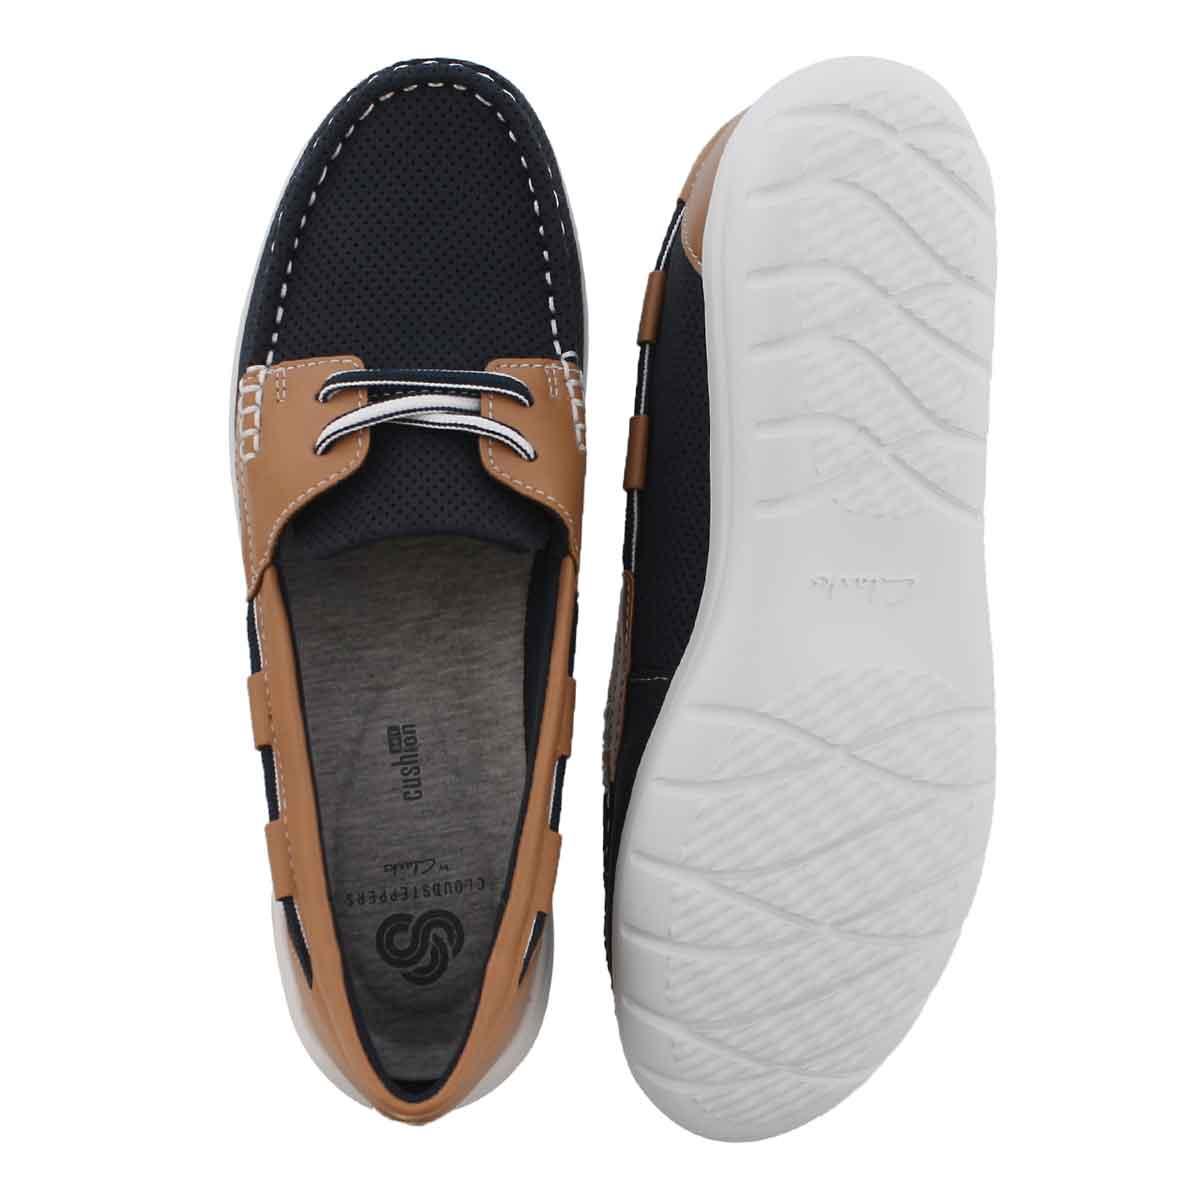 Lds Jocolin Vista navy boat shoe